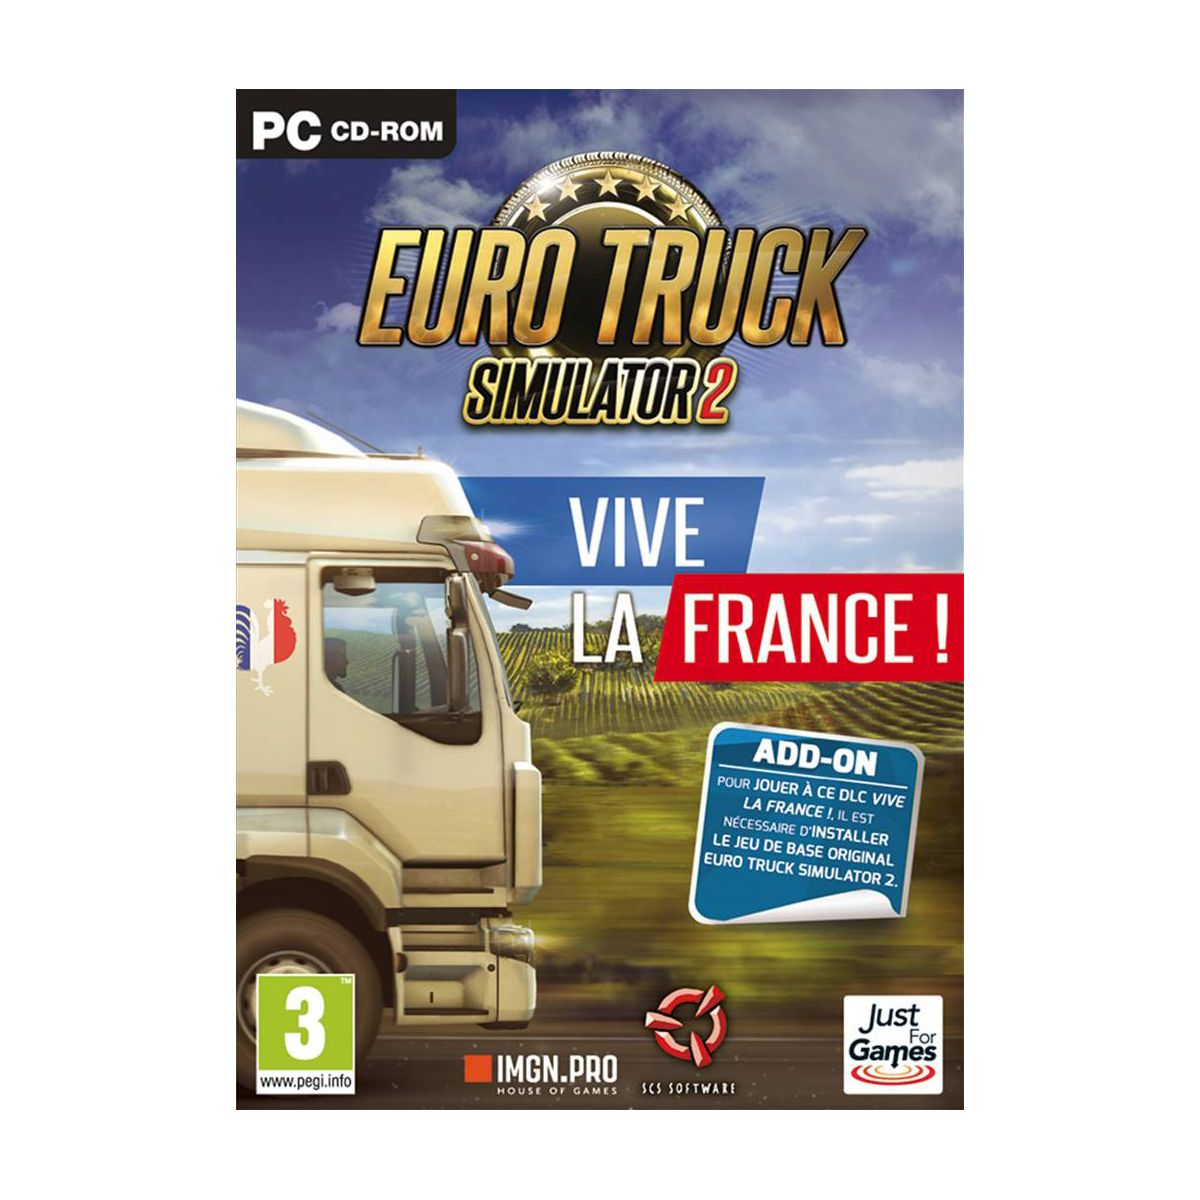 Jeu PC JUST FOR GAMES Euro Truck 2 Simulator - Vive la France (photo)